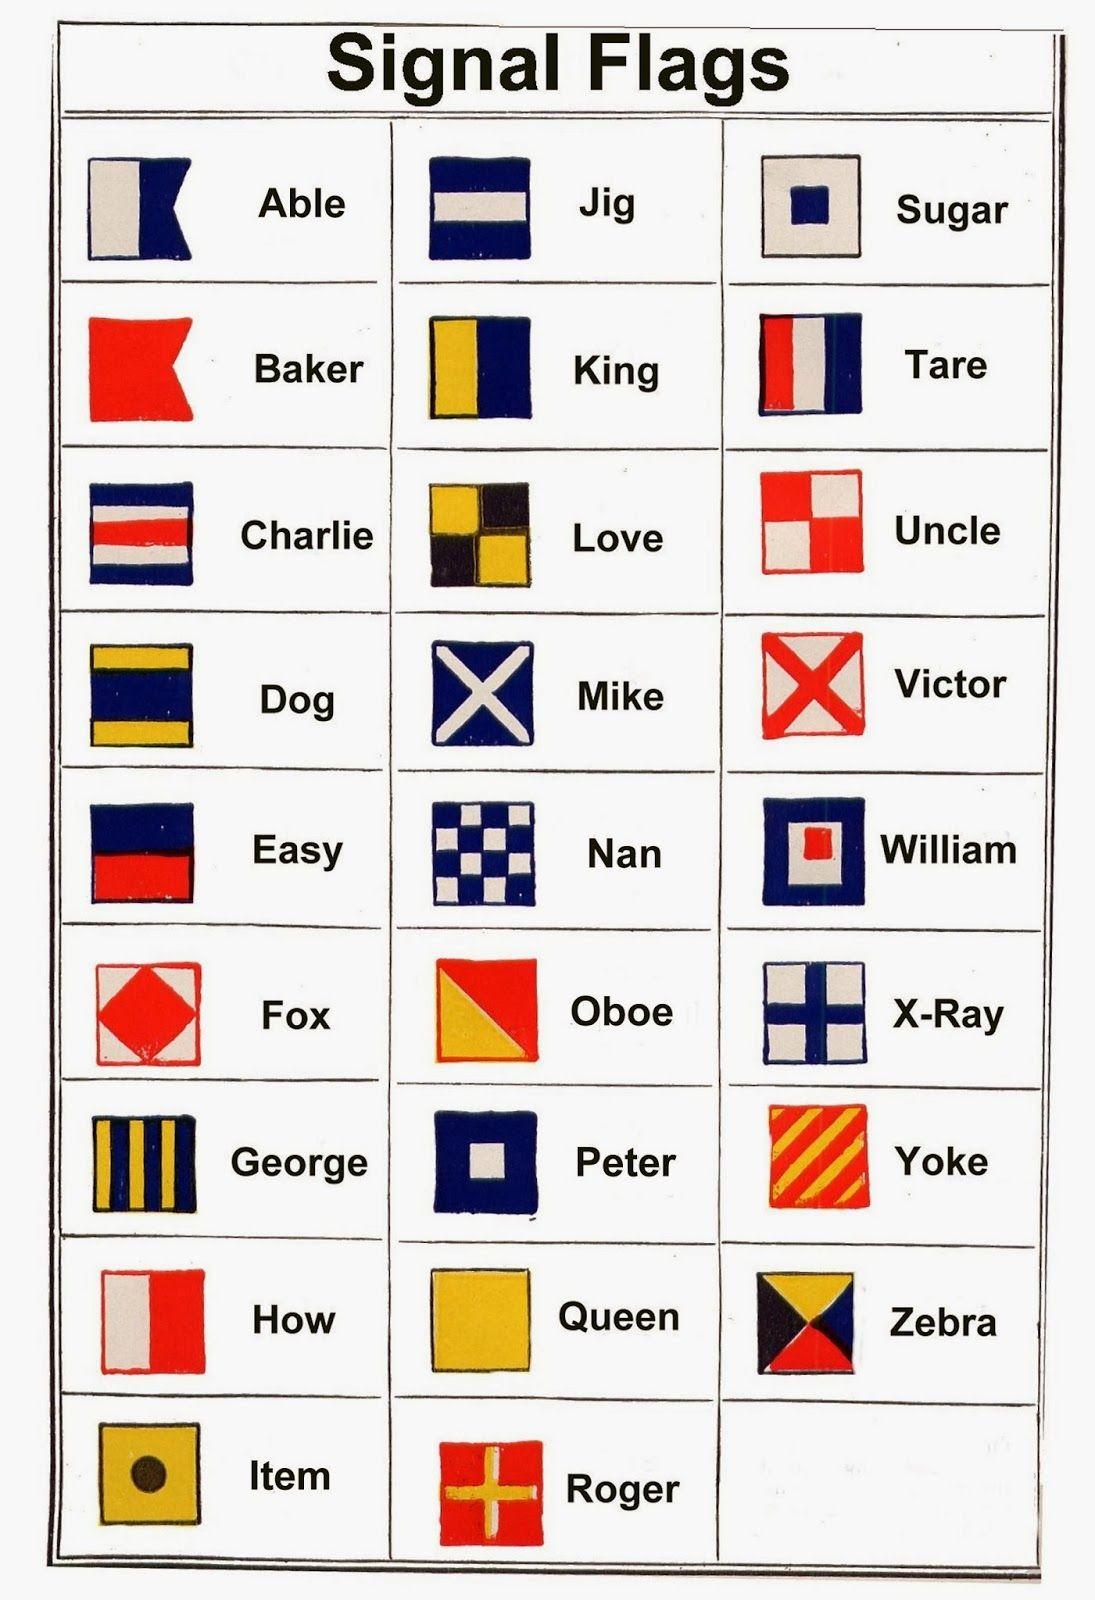 Nautical Handcrafted Decor And Ship Models International Maritime Signal Flags Nautical Signal Flags Signal Flags Nautical Flags